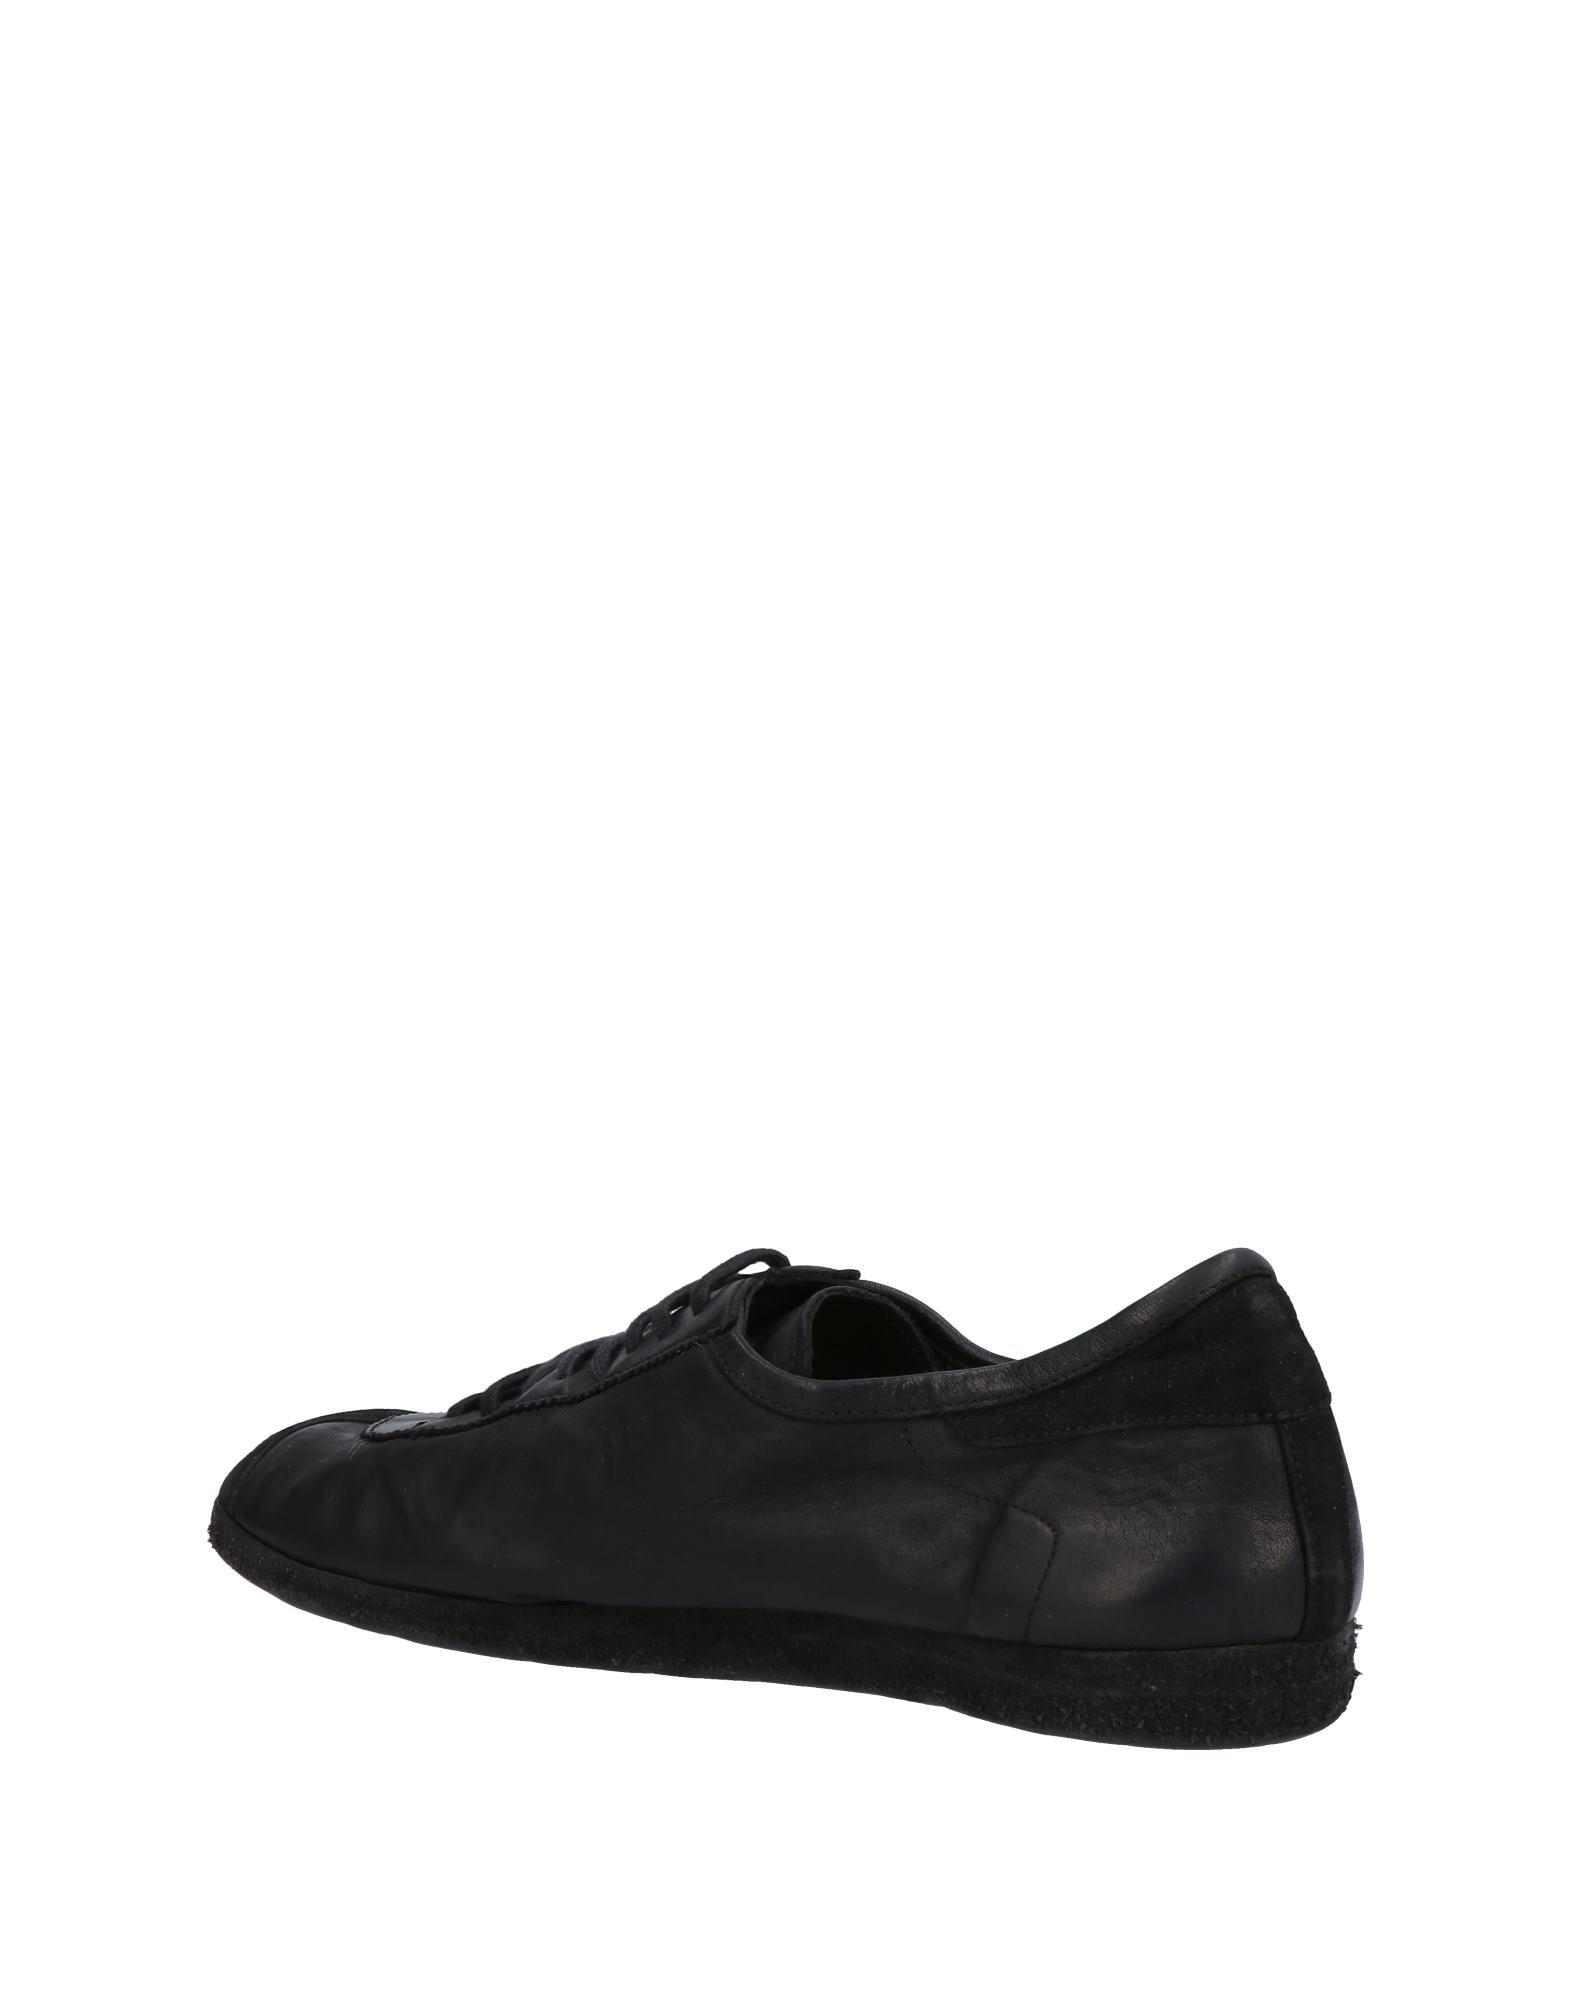 Sneakers Guidi Femme - Sneakers Guidi sur